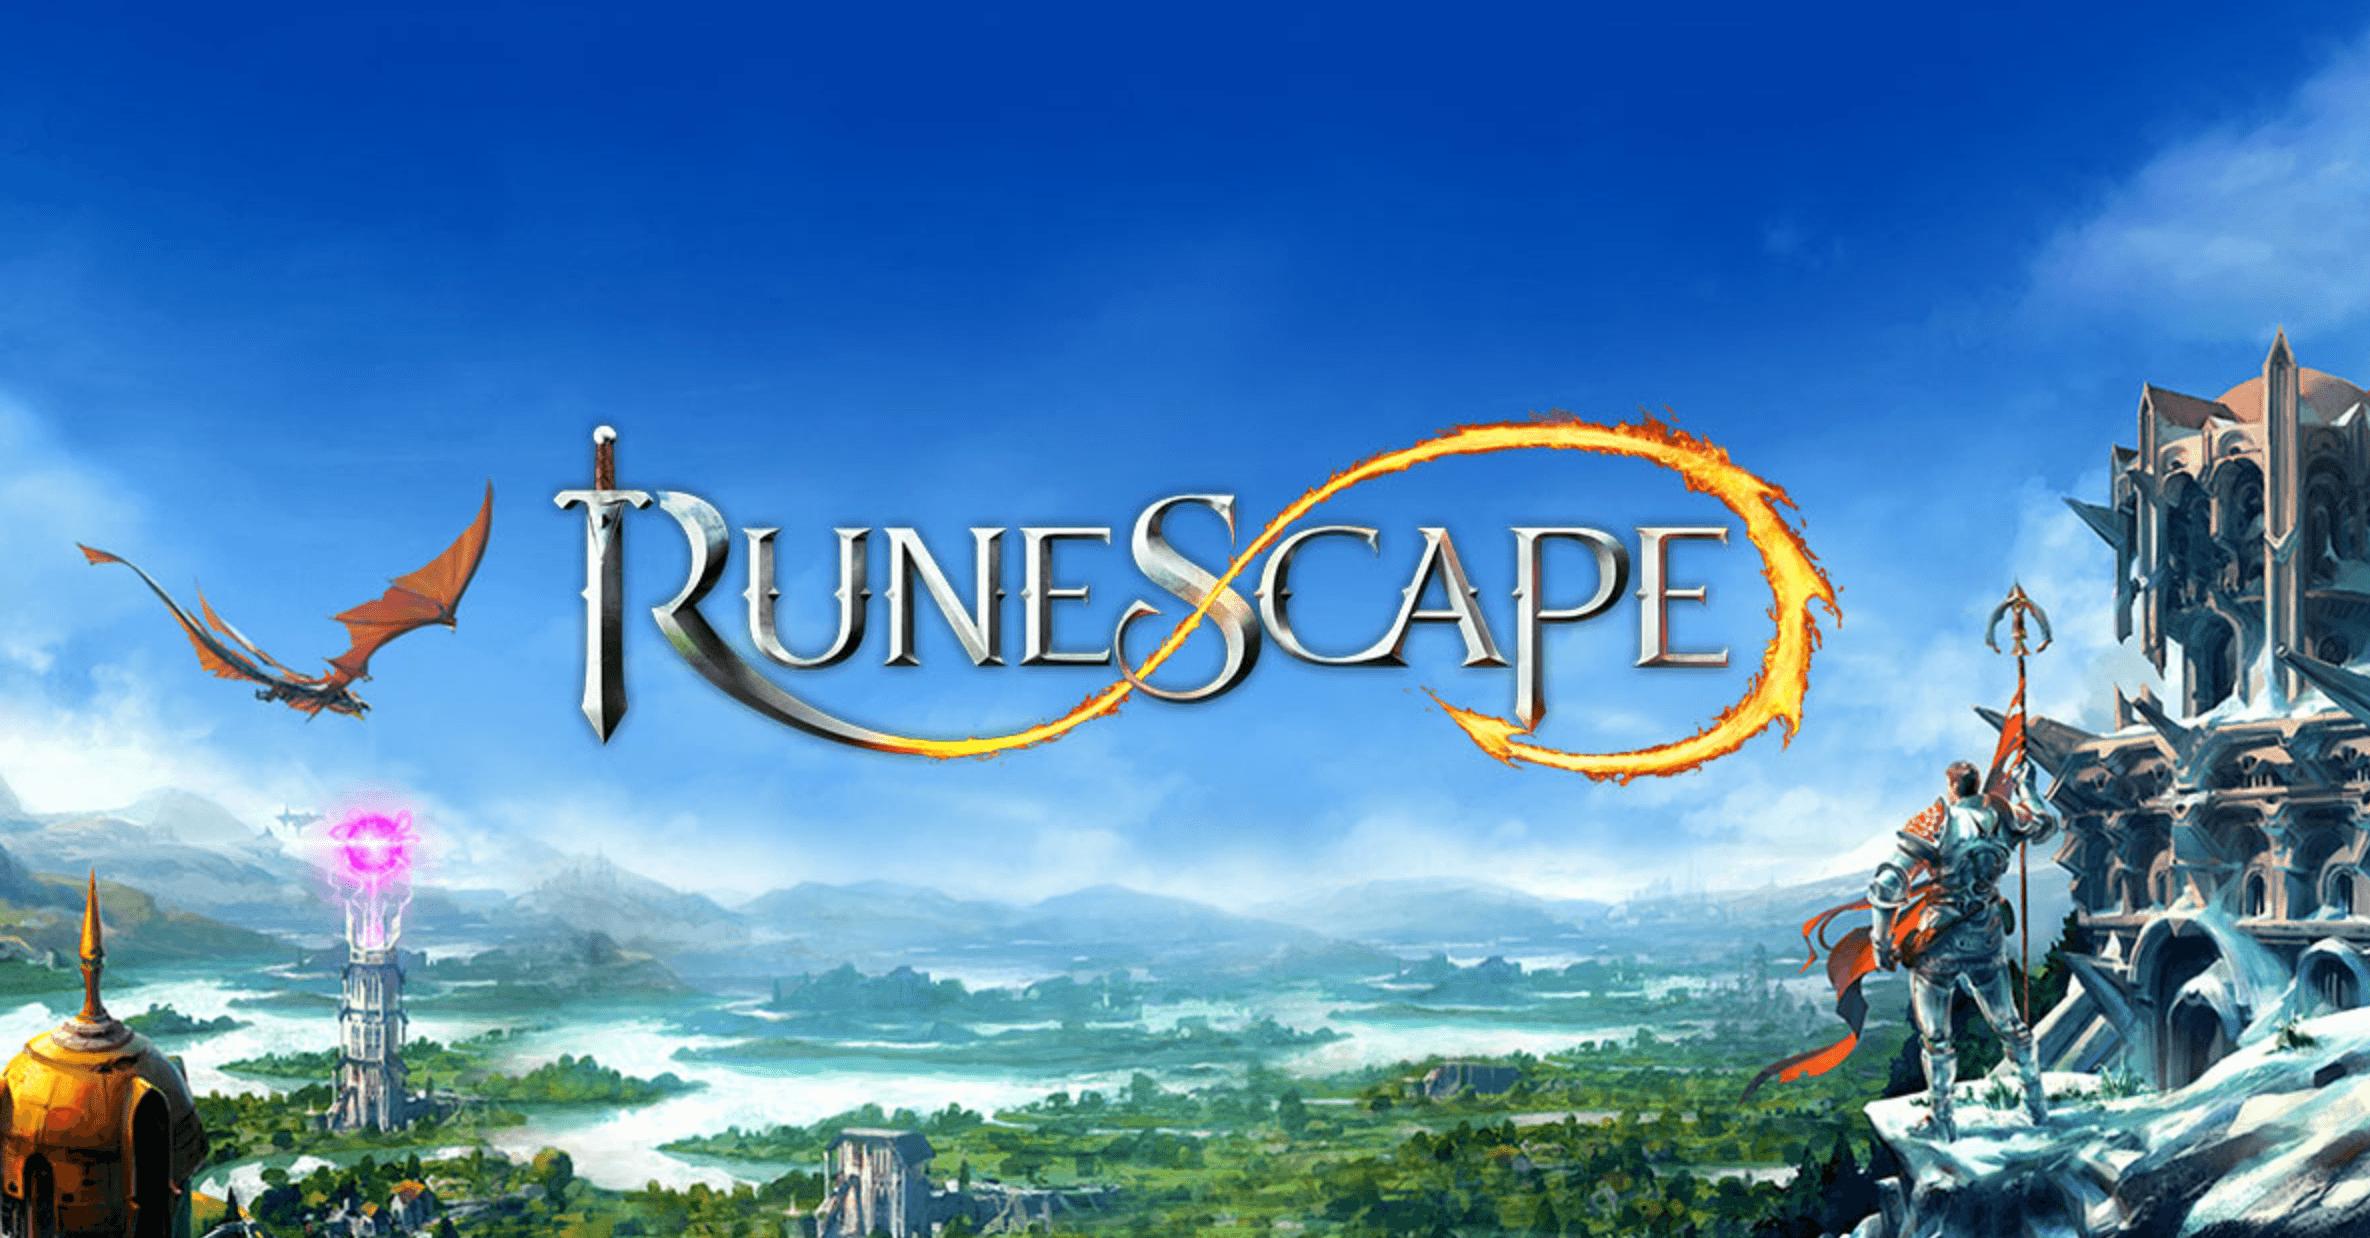 runescape landscape cover photo